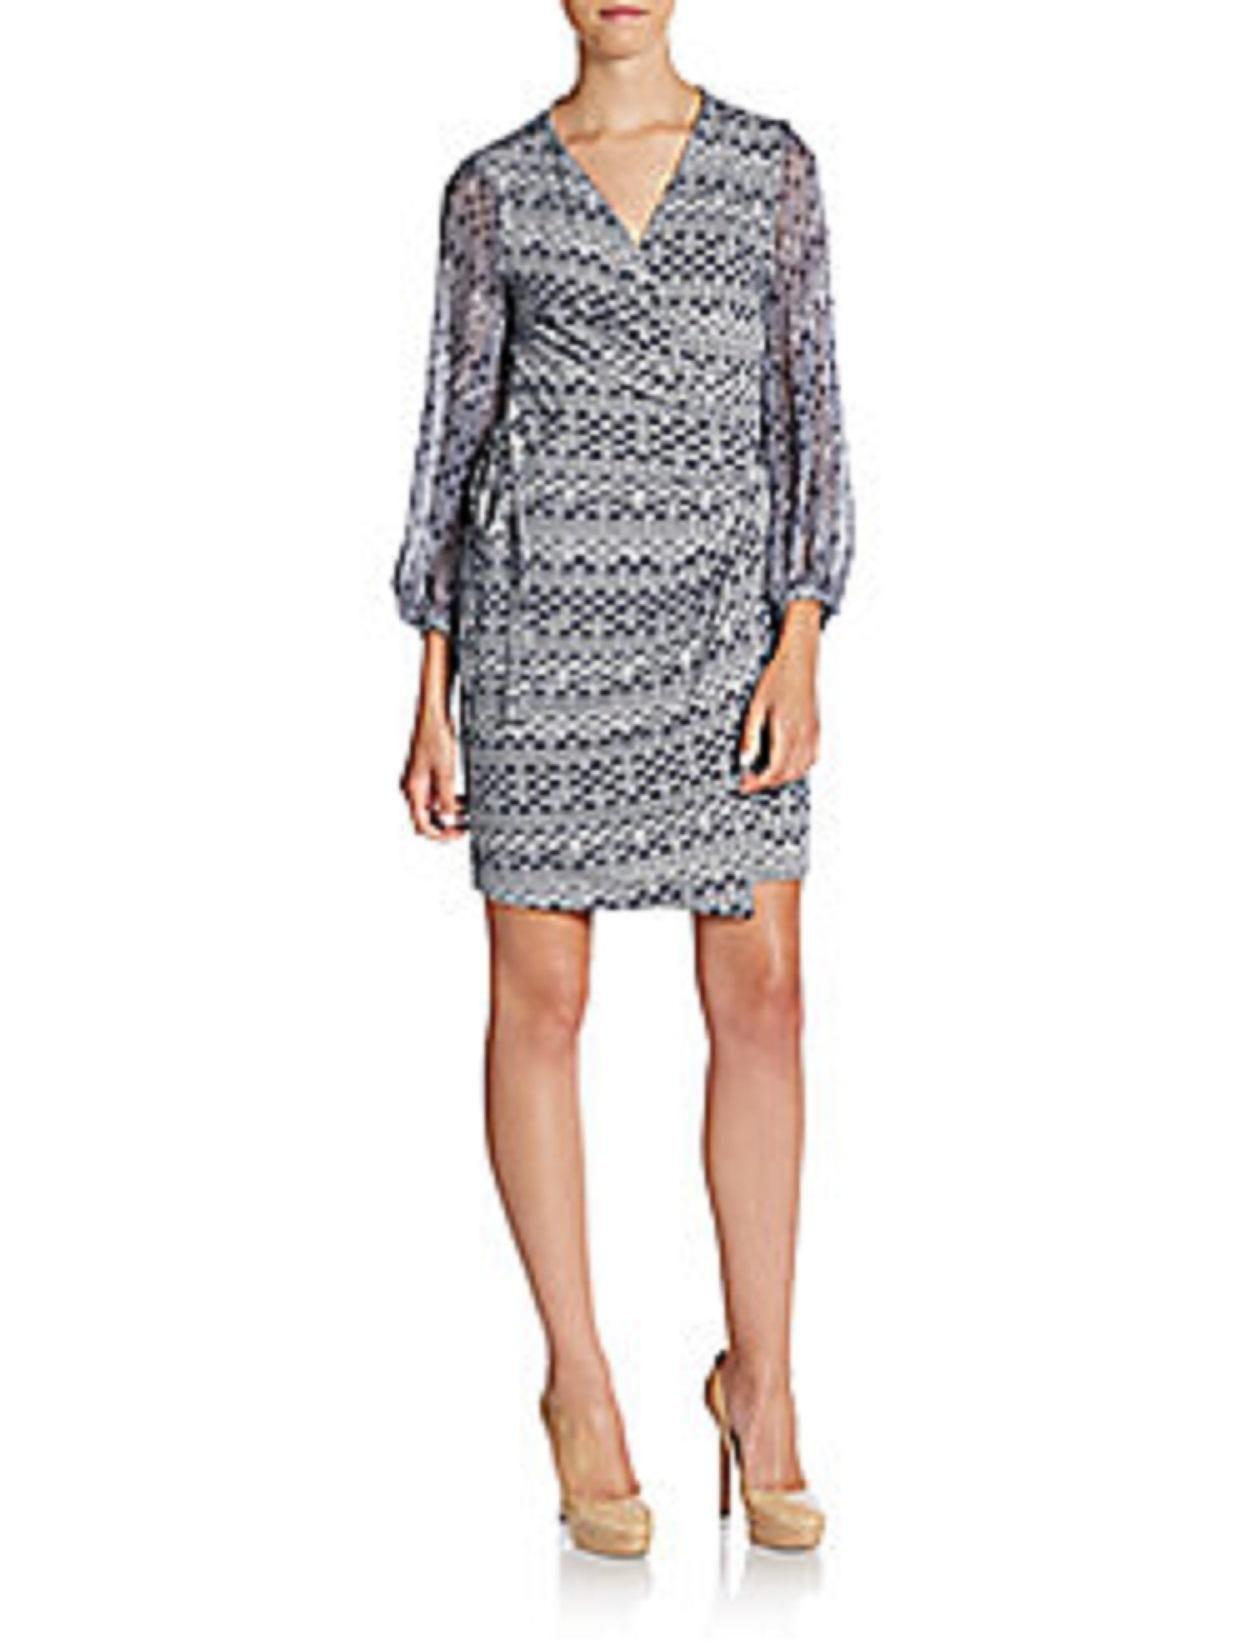 bb190c64ba Diane Von Furstenberg Sigourney Wrap Dress. Free shipping and guaranteed  authenticity on Diane Von Furstenberg Sigourney Wrap Dress at Tradesy.